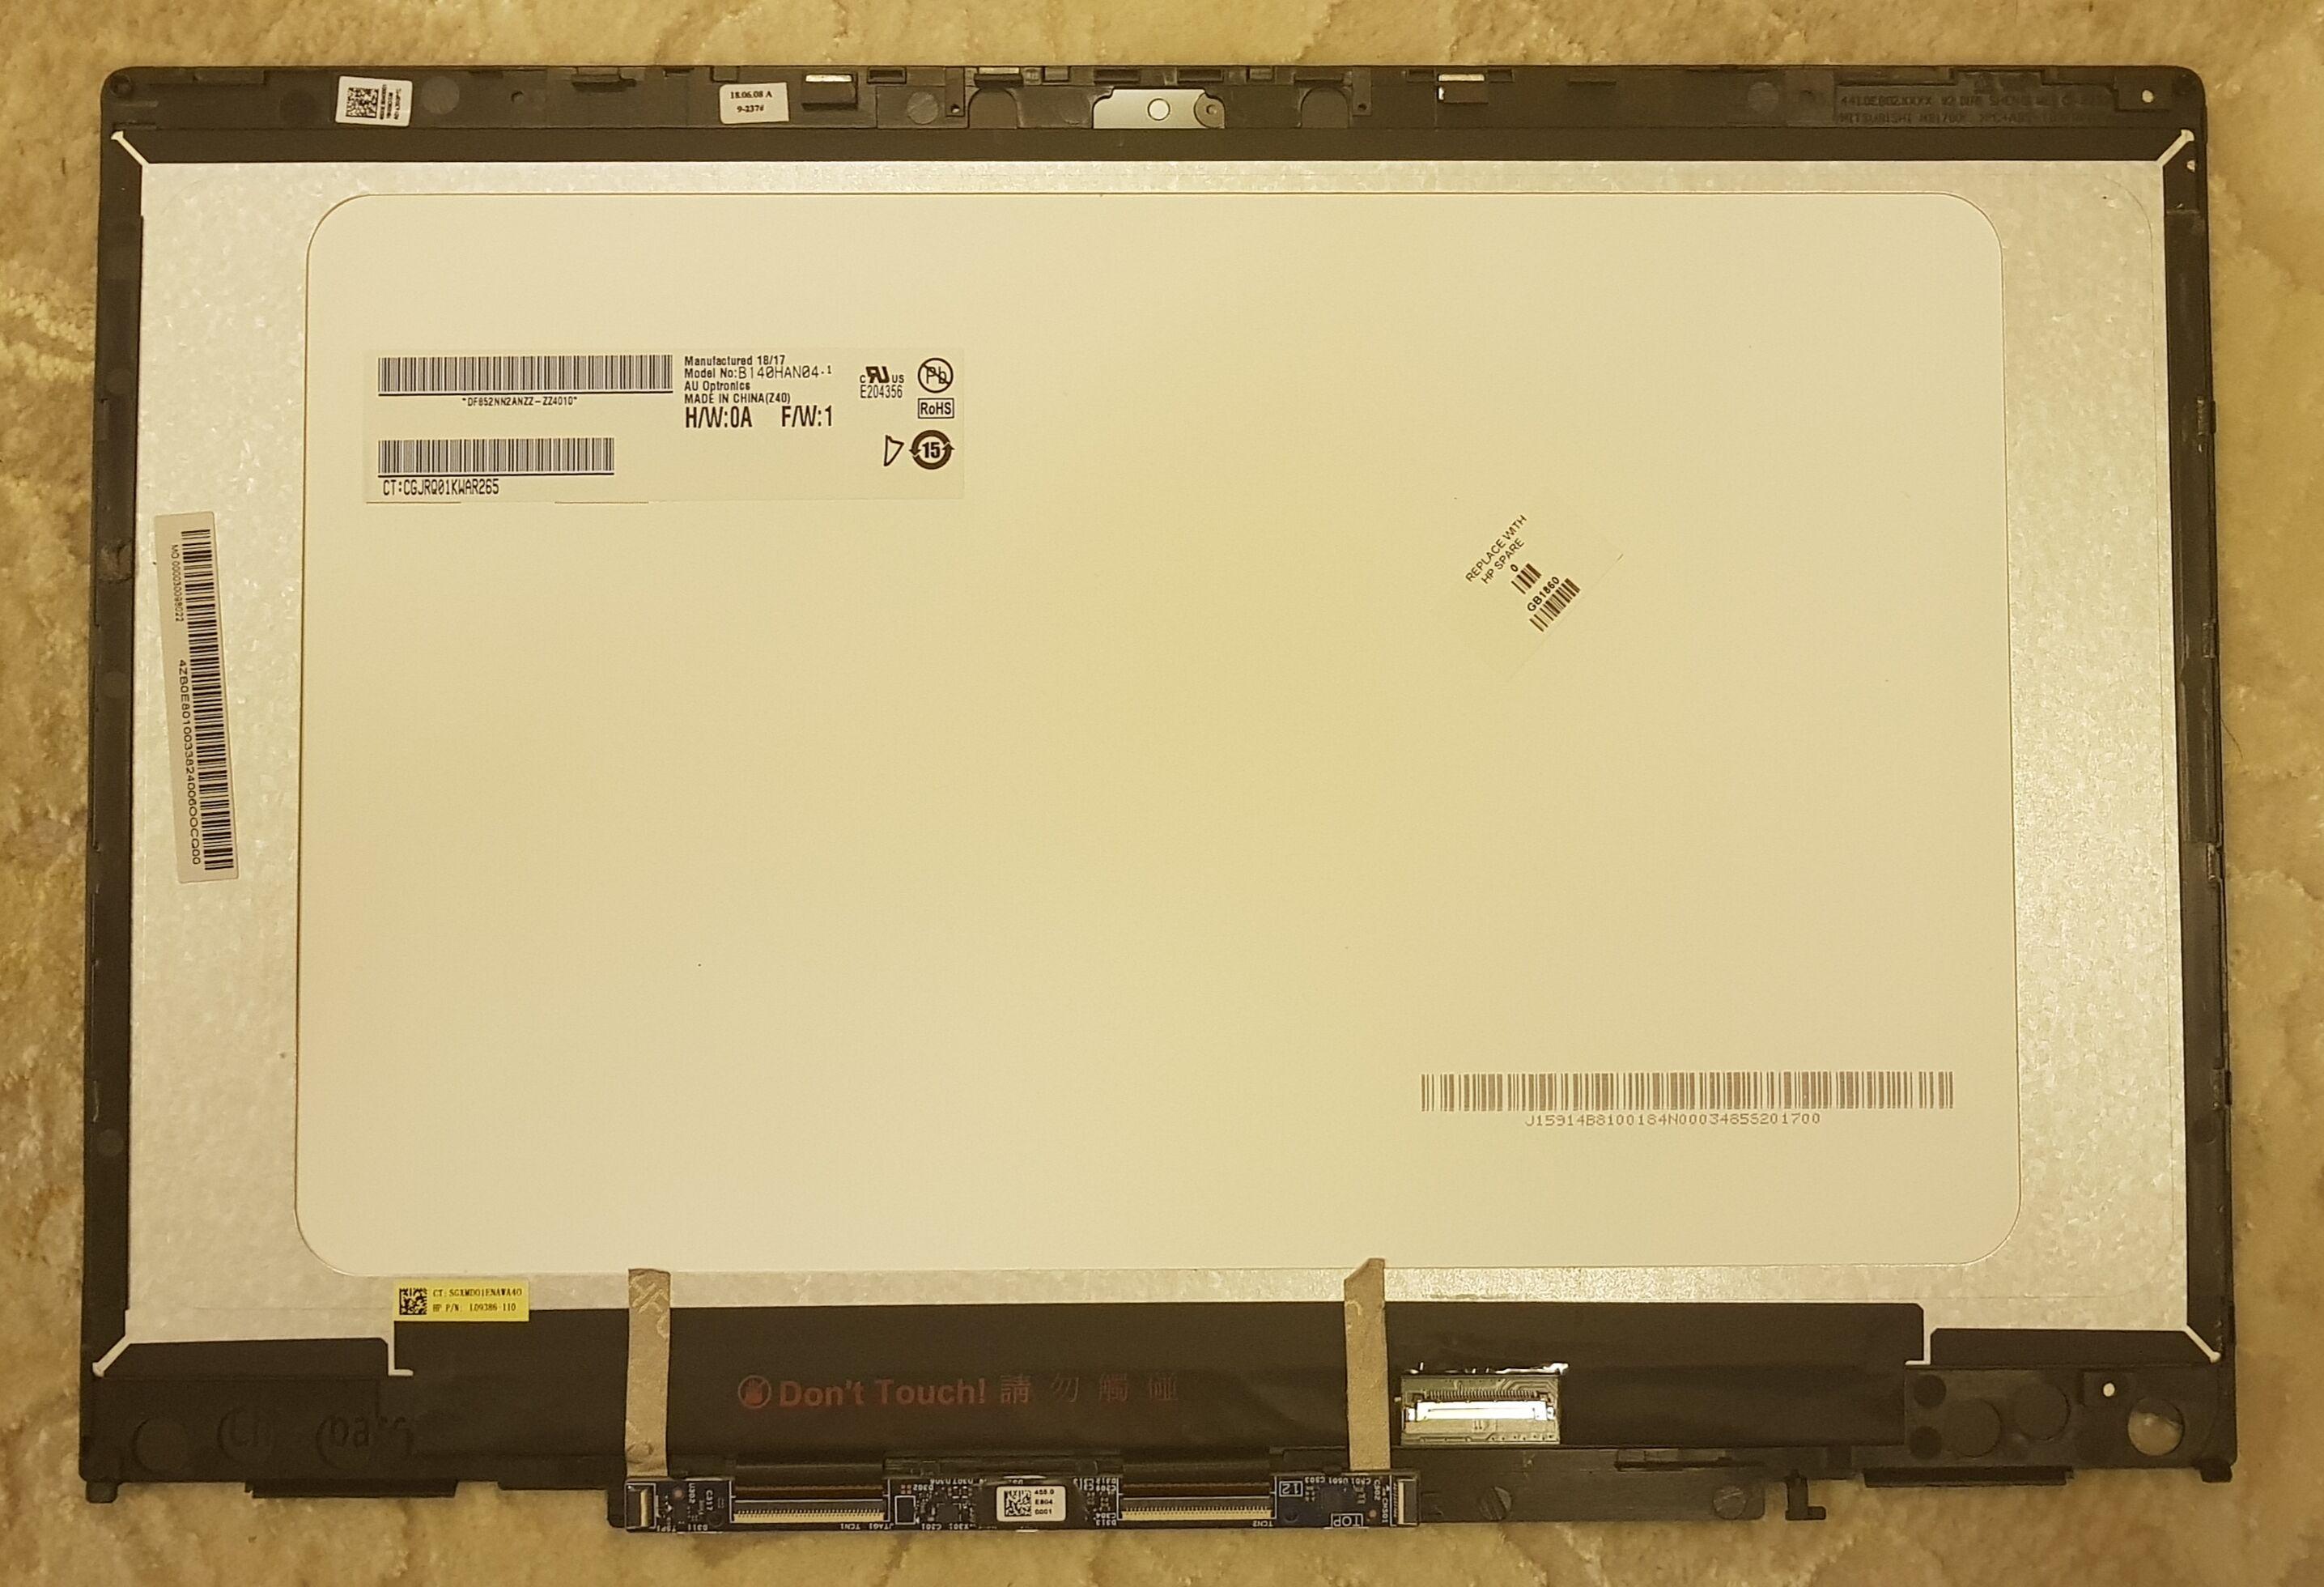 Para HP Pavilion x360 14-cd0015tx 14-cd0016tx 14-cd0017tx 14-cd0018tx IPS FHD pantalla LCD pantalla táctil digitalizador montaje bisel